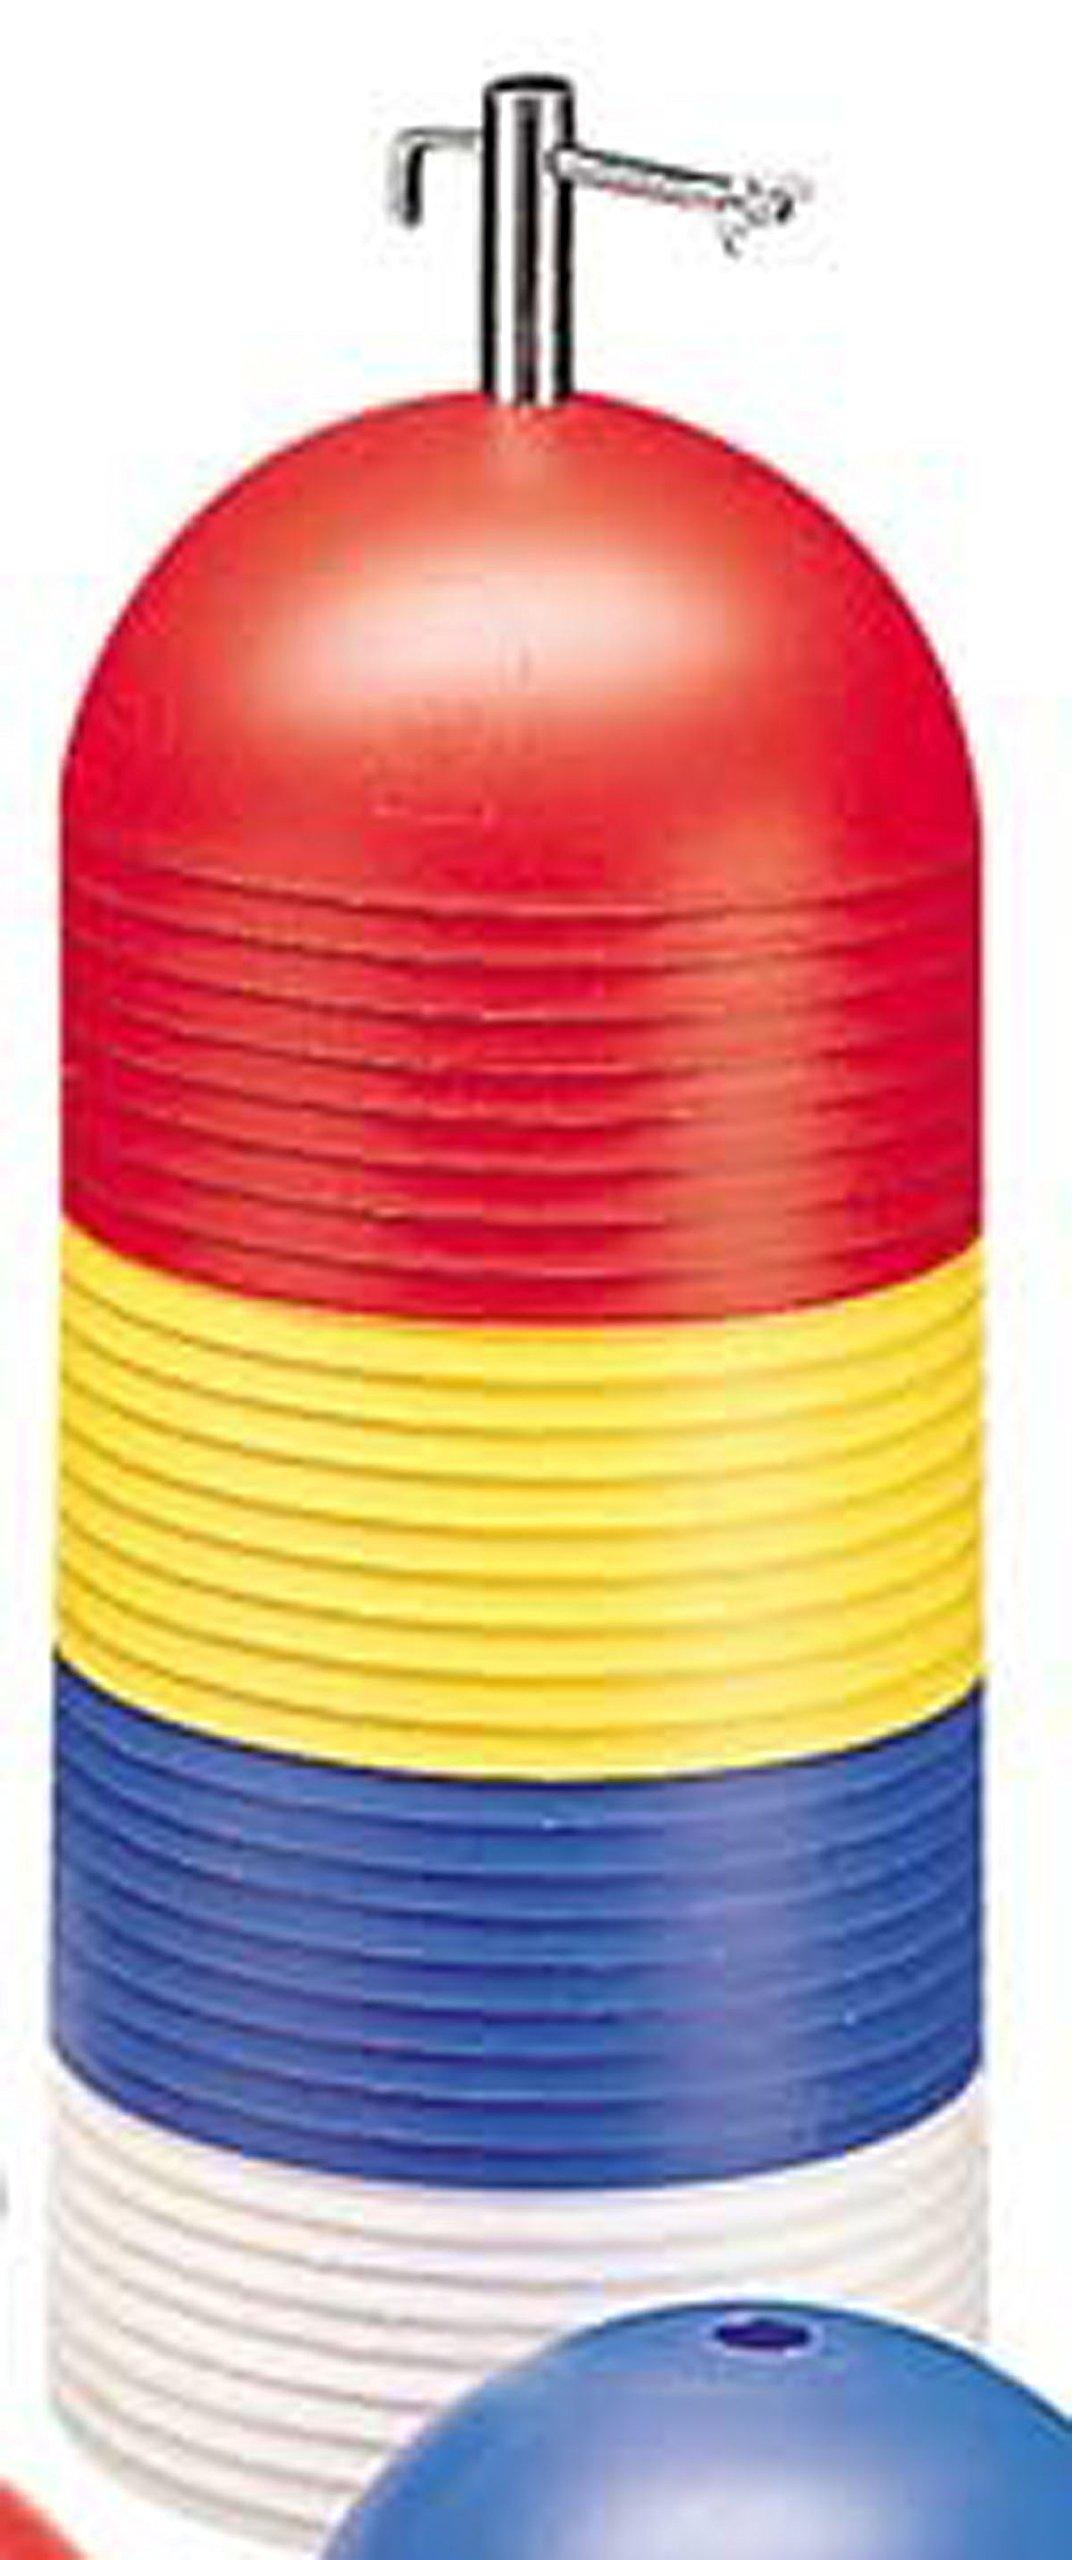 Multi Sports Rigid Plastic Marker Bowl Cones Set Of 40 Assorted